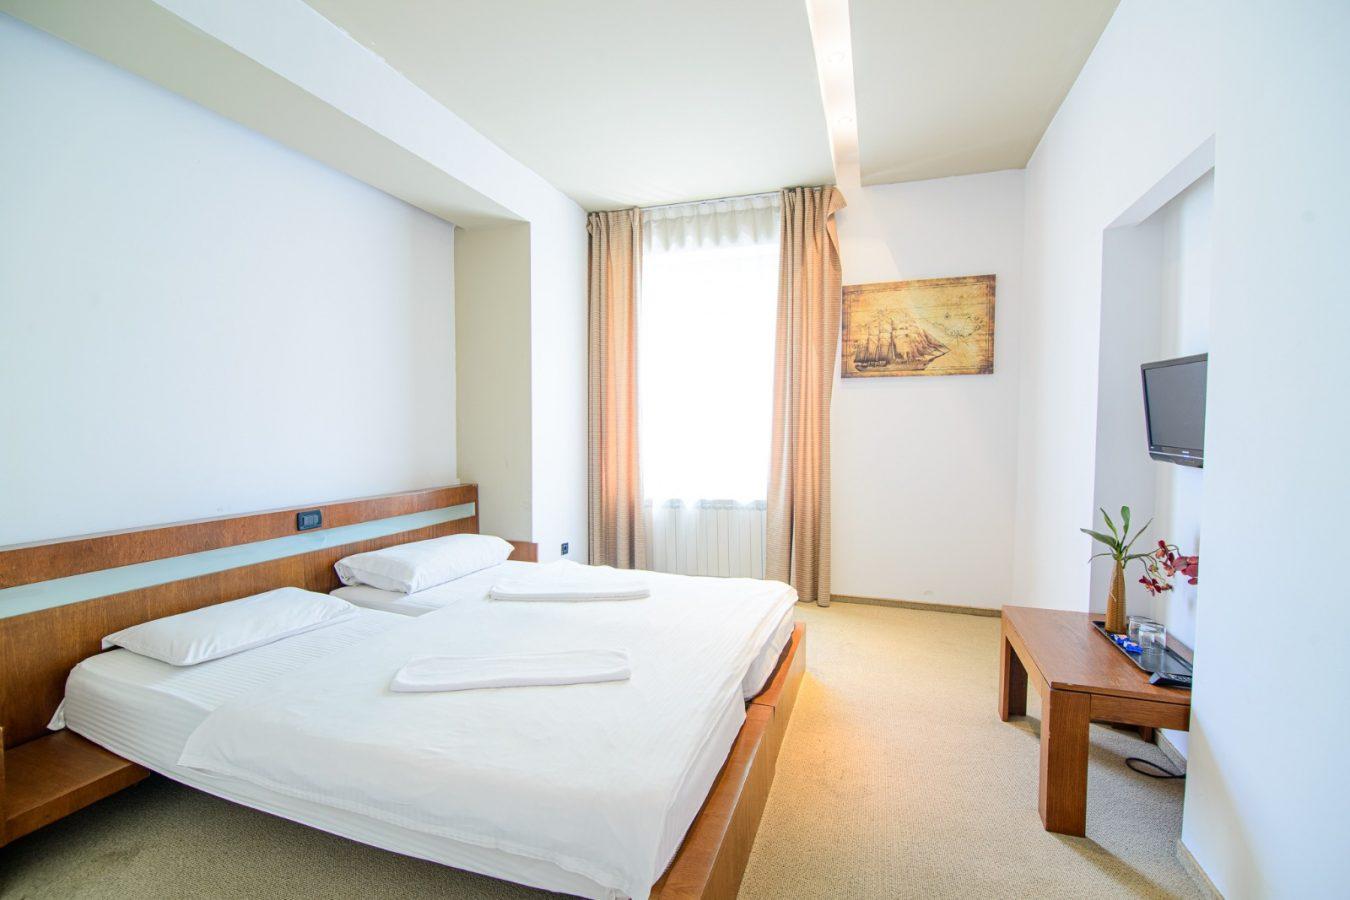 HotelVitalFelix camera dubla